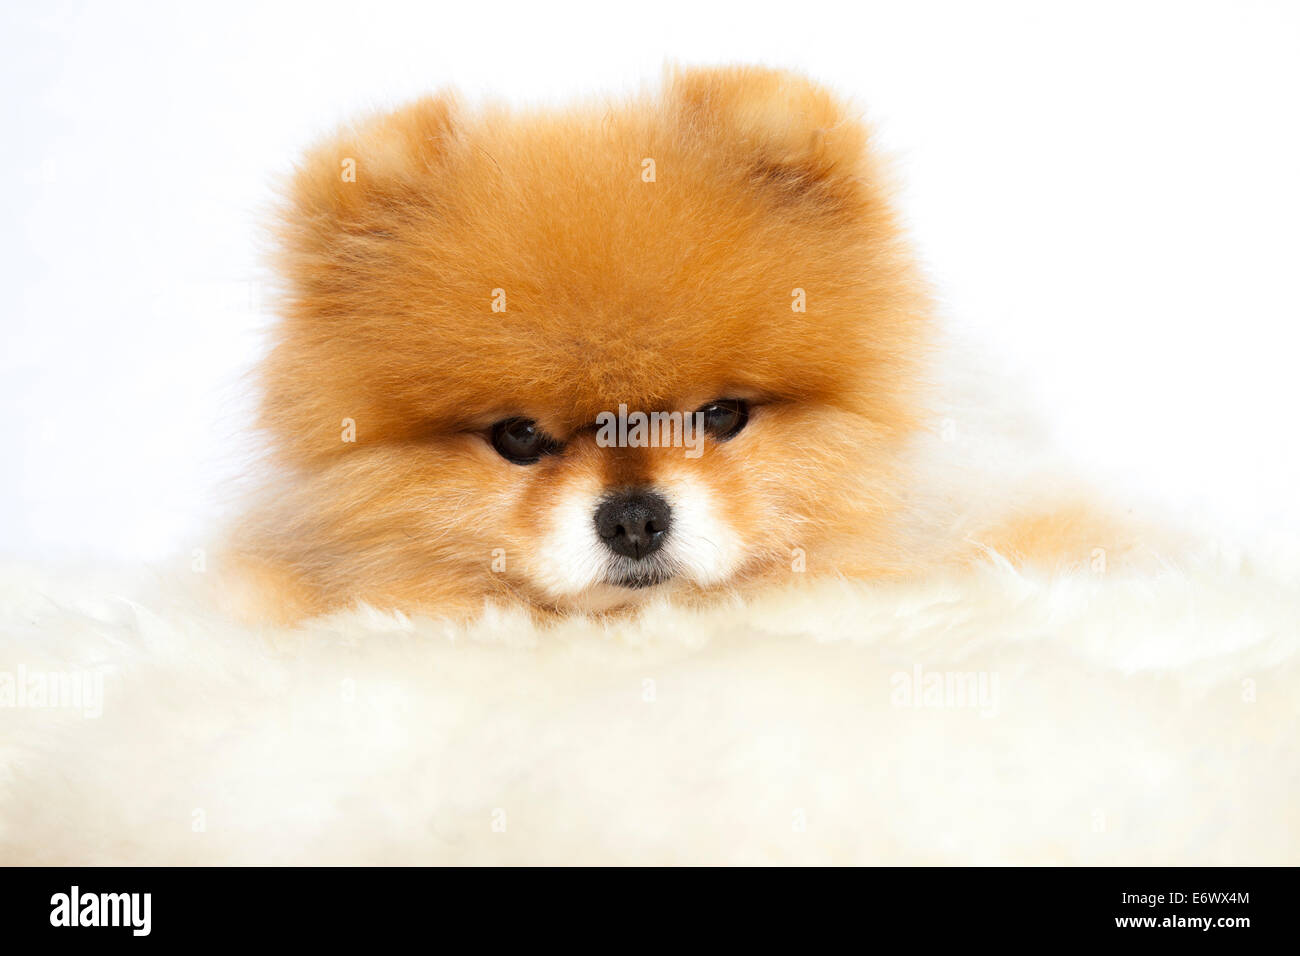 Pomeranian lying on a fur - Stock Image